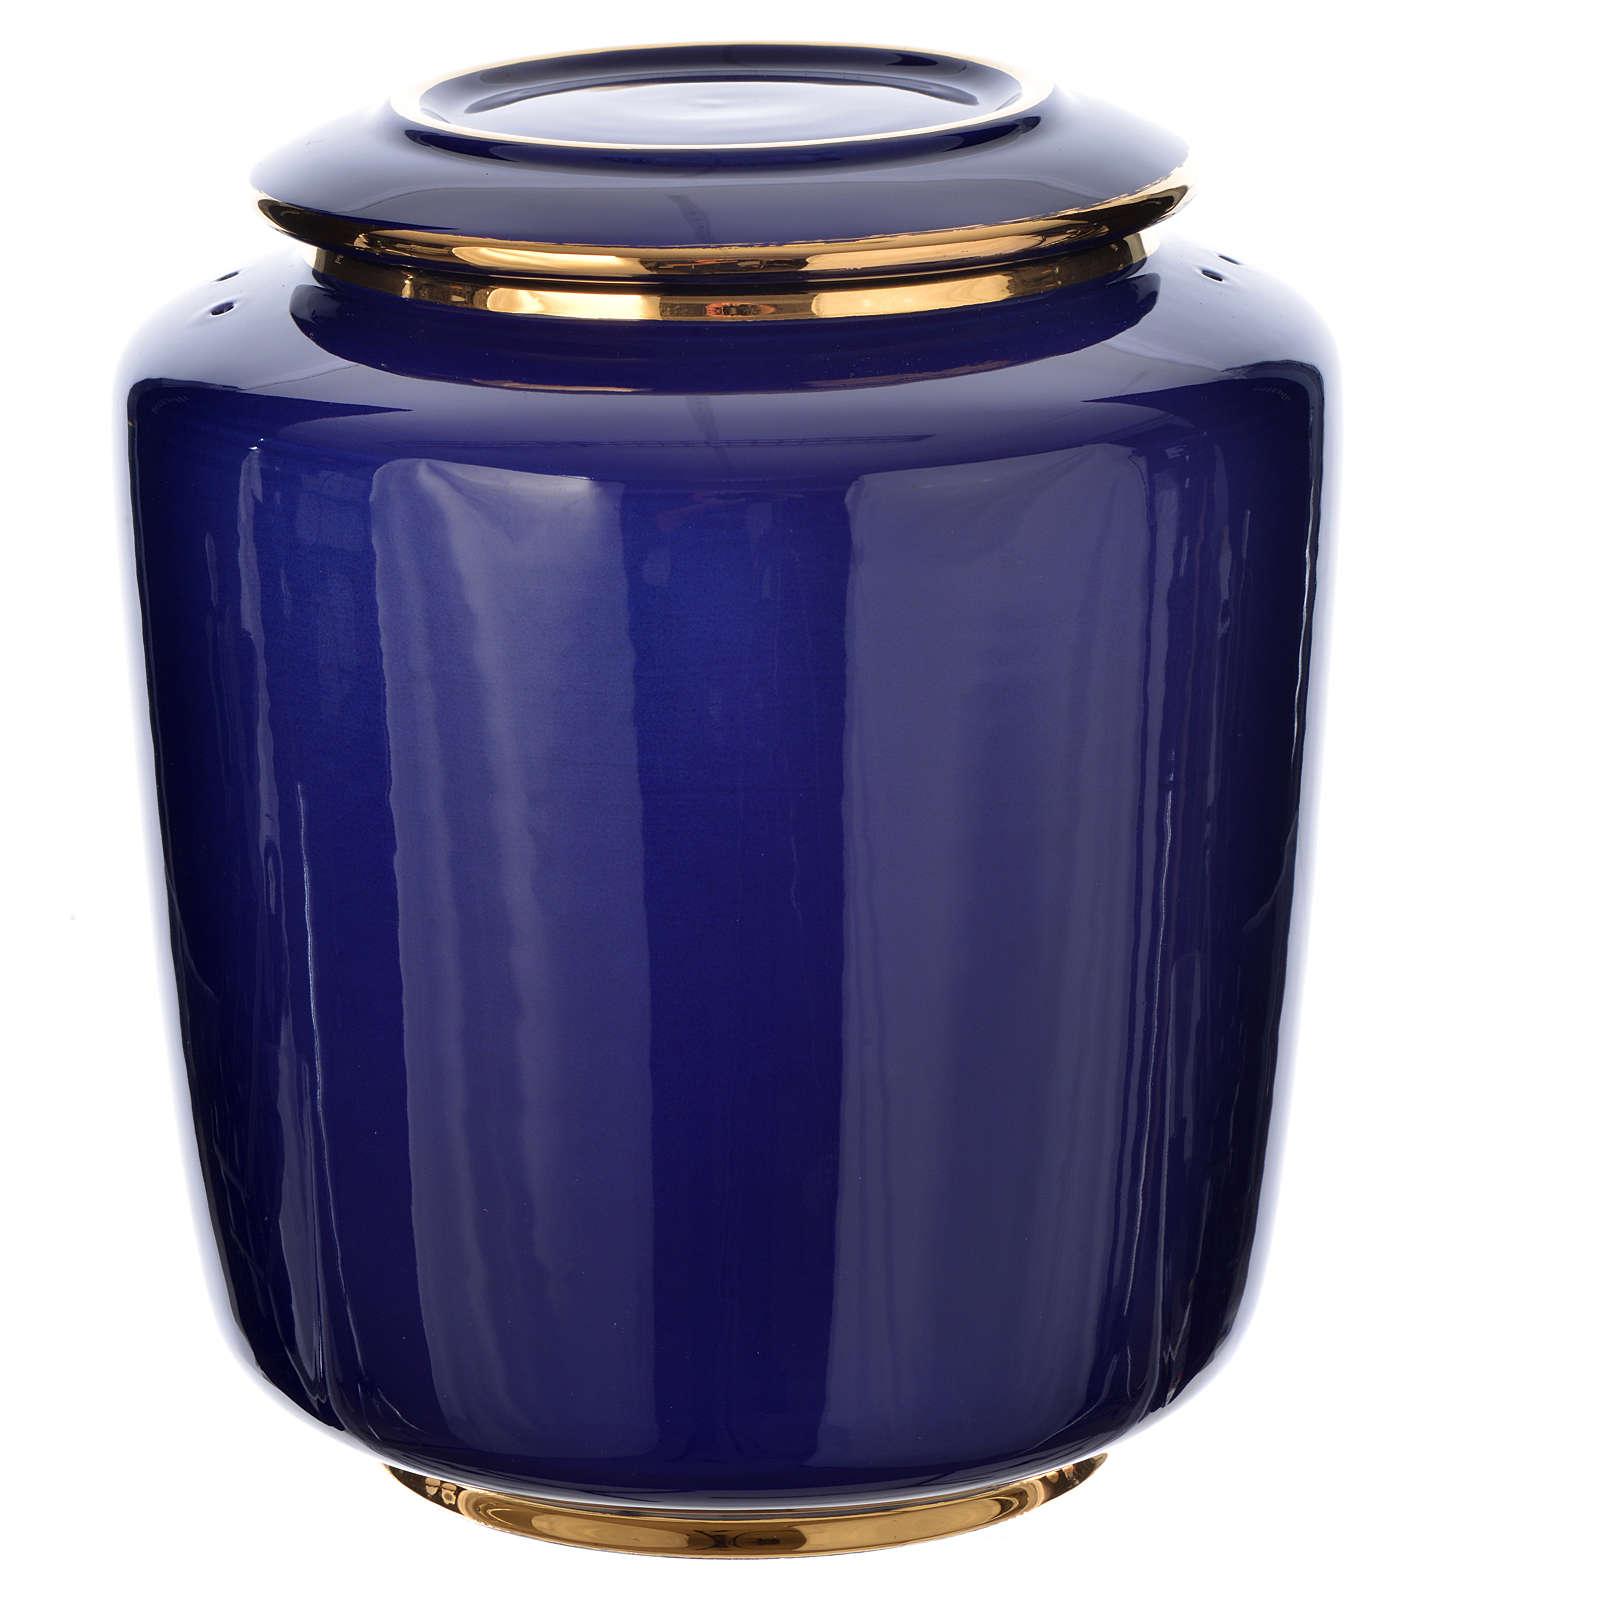 Urna cineraria porcellana smaltata mod. Blu Oro 3